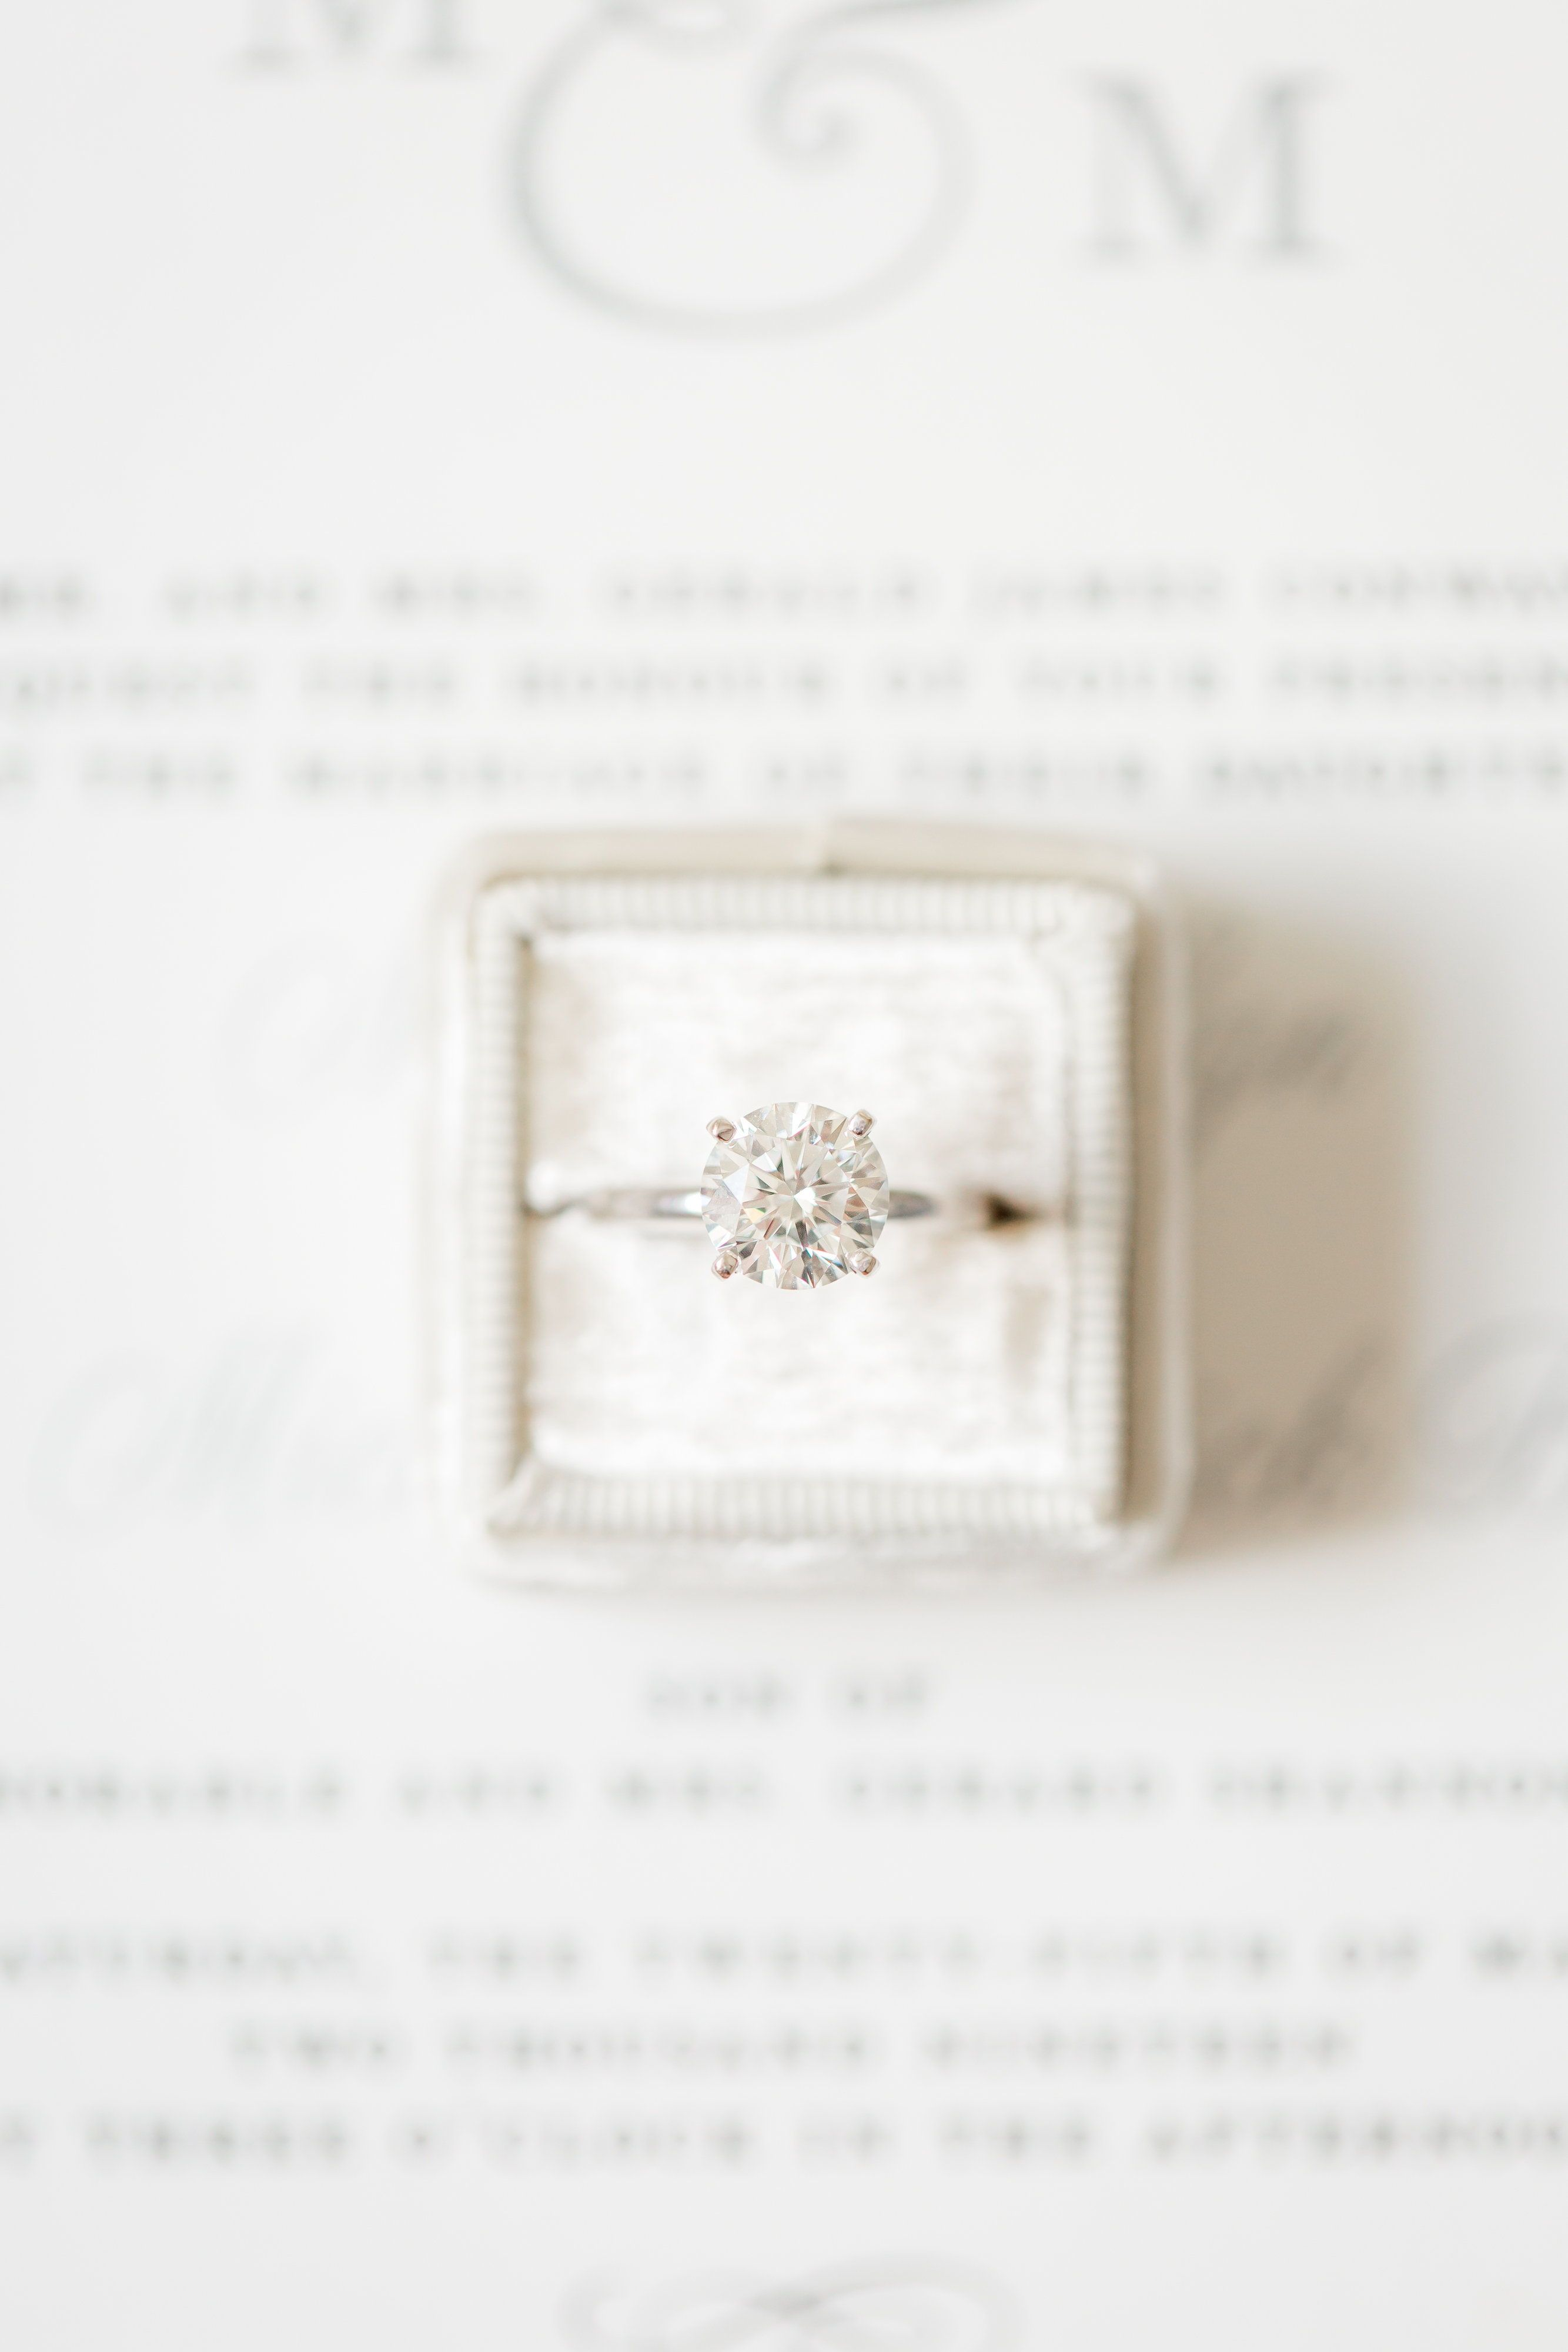 Timeless Spring Wedding Nj Wedding Photographer Glamorous Wedding Rings Nj Weddings